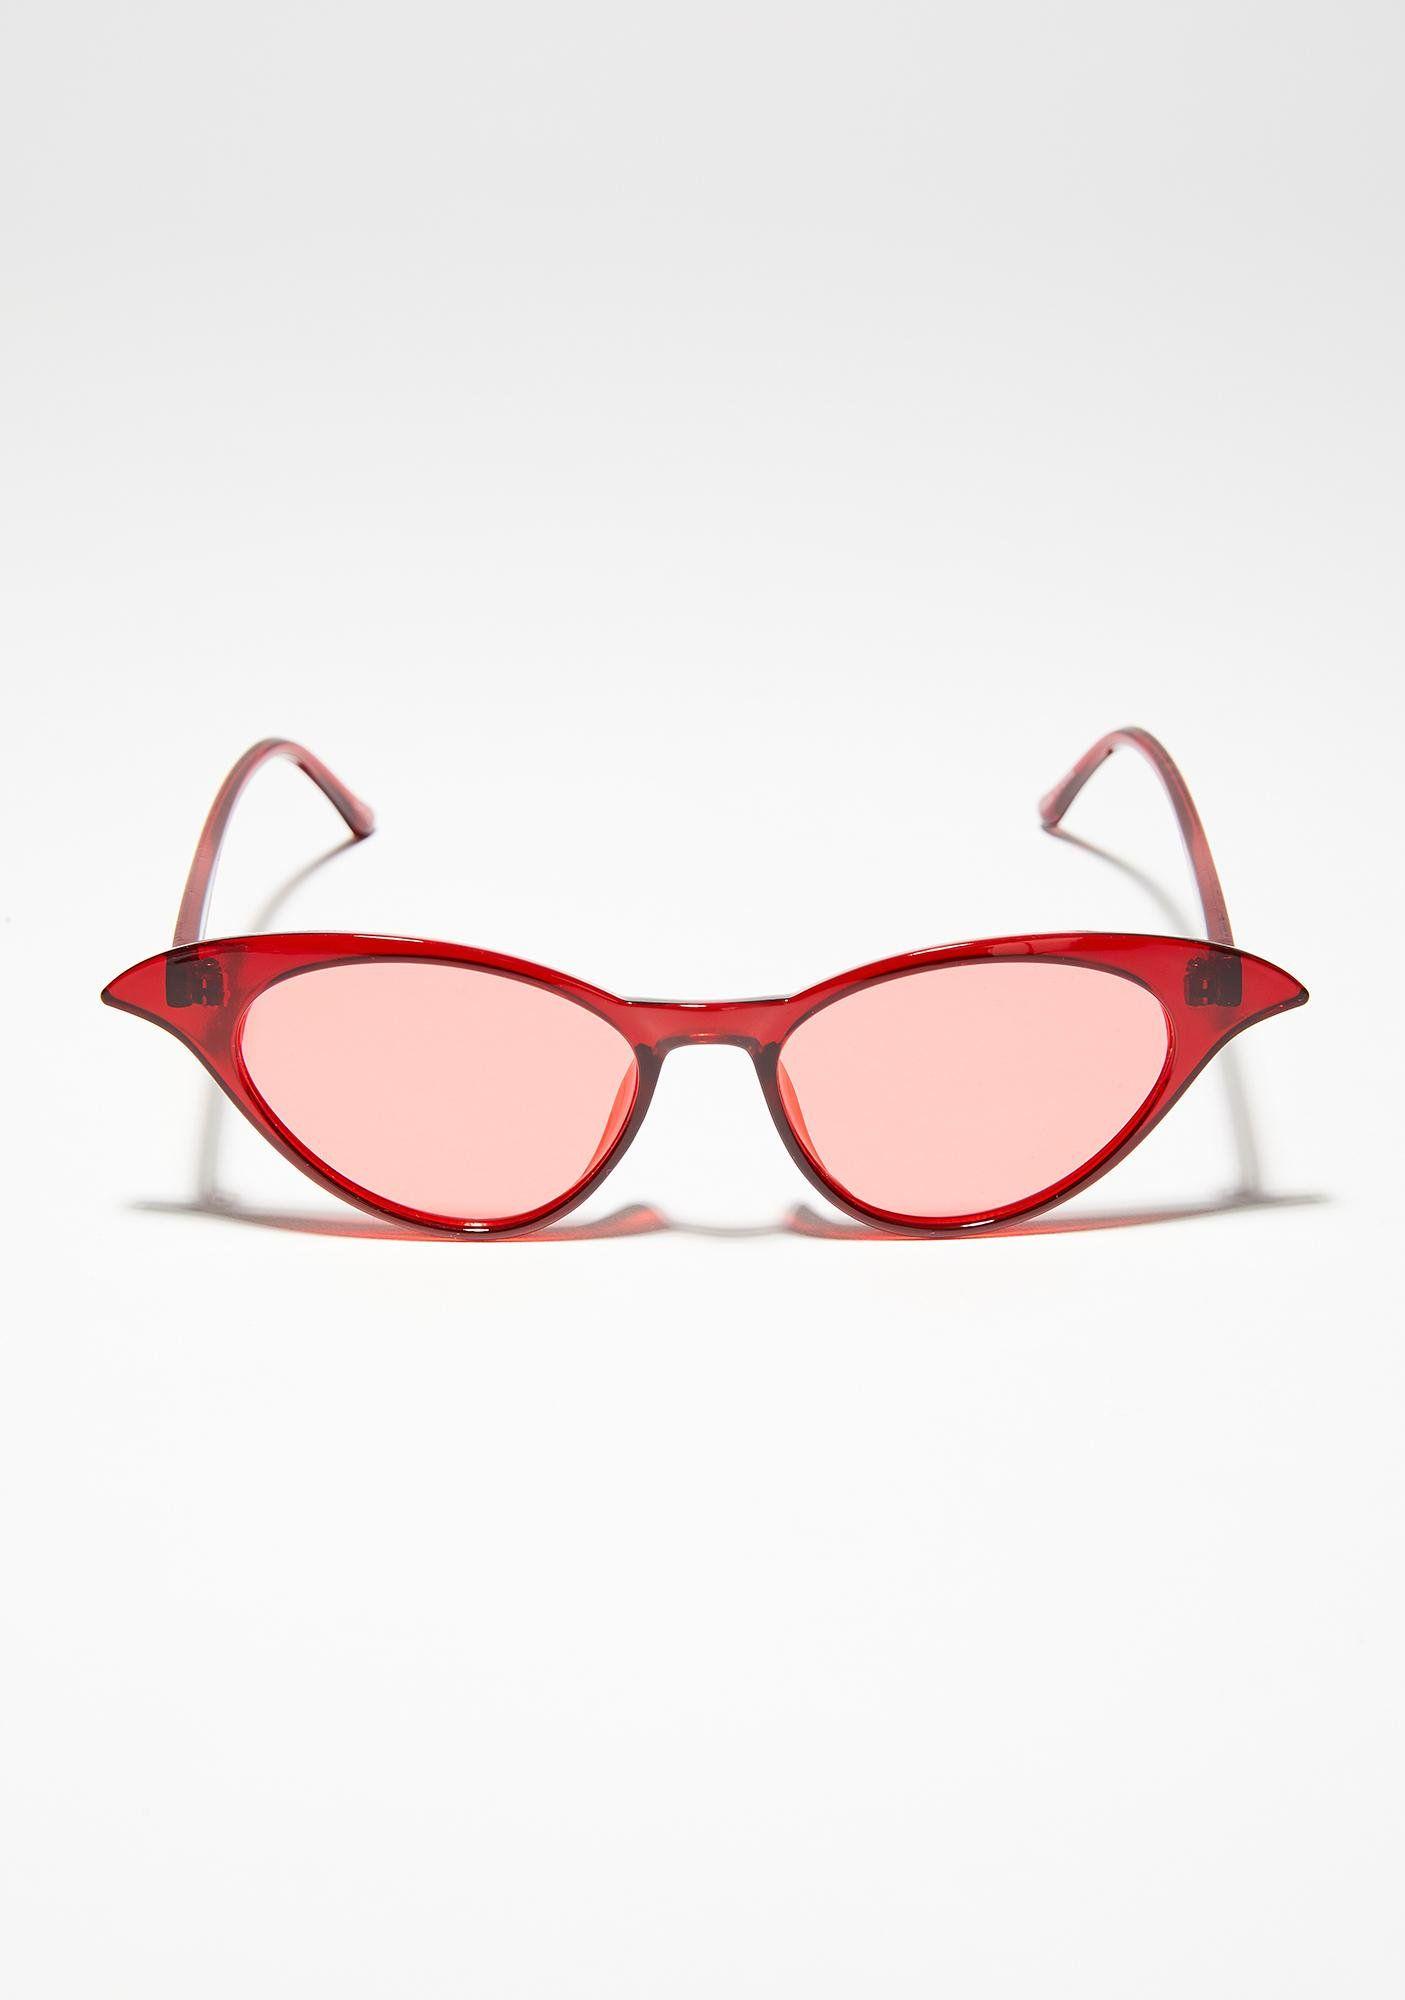 d975f711dc Devil Bad N  Catty Sunglasses. Visit. January 2019